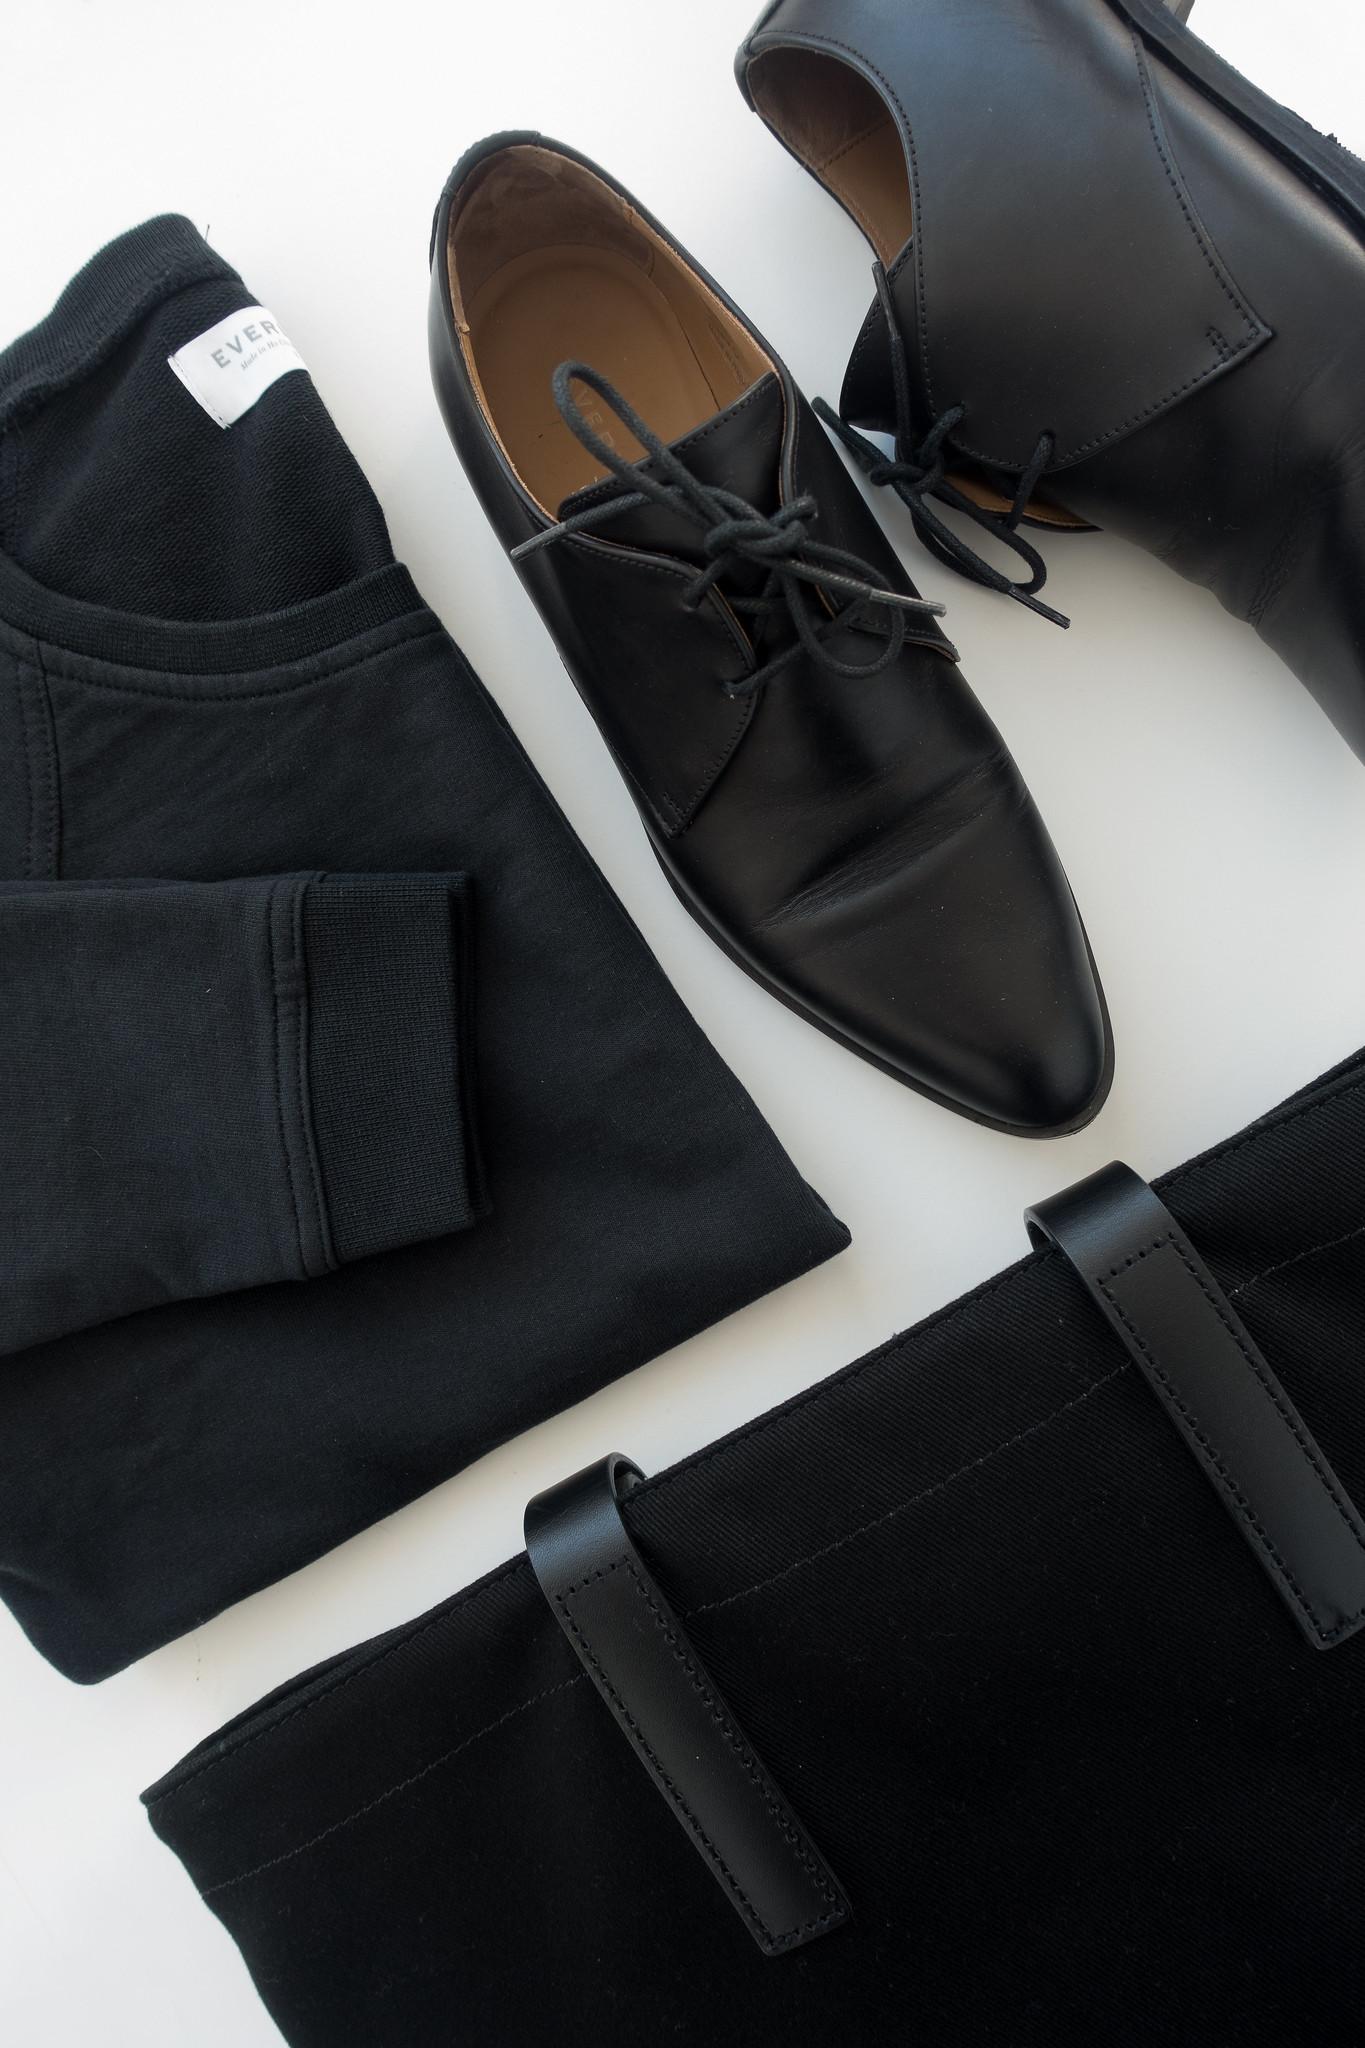 Shop Everlane: High Quality Basics